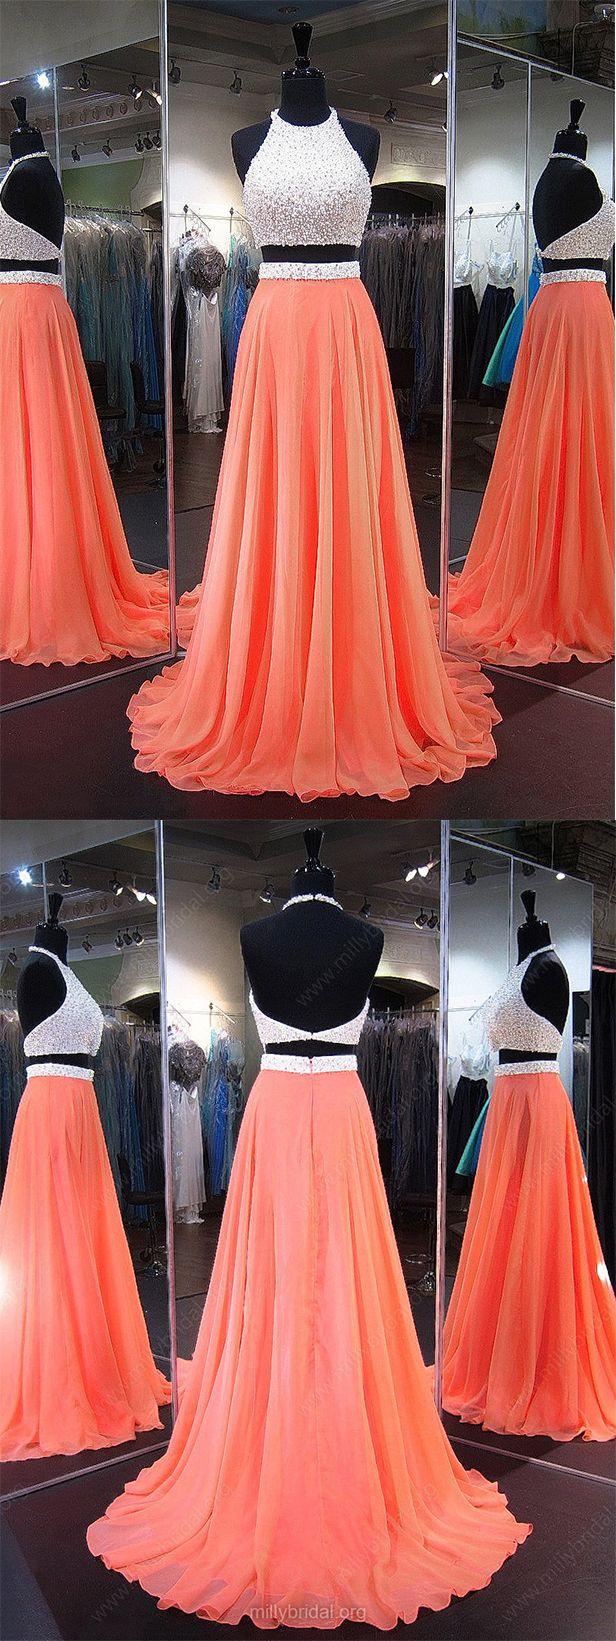 Perfect #PromDress,A-line Prom Dress,#Halter Prom Gown,#Chiffon Prom Dresses,#Crystal Prom Dress,Backless Prom Dress,#TwoPiece Prom Dresses